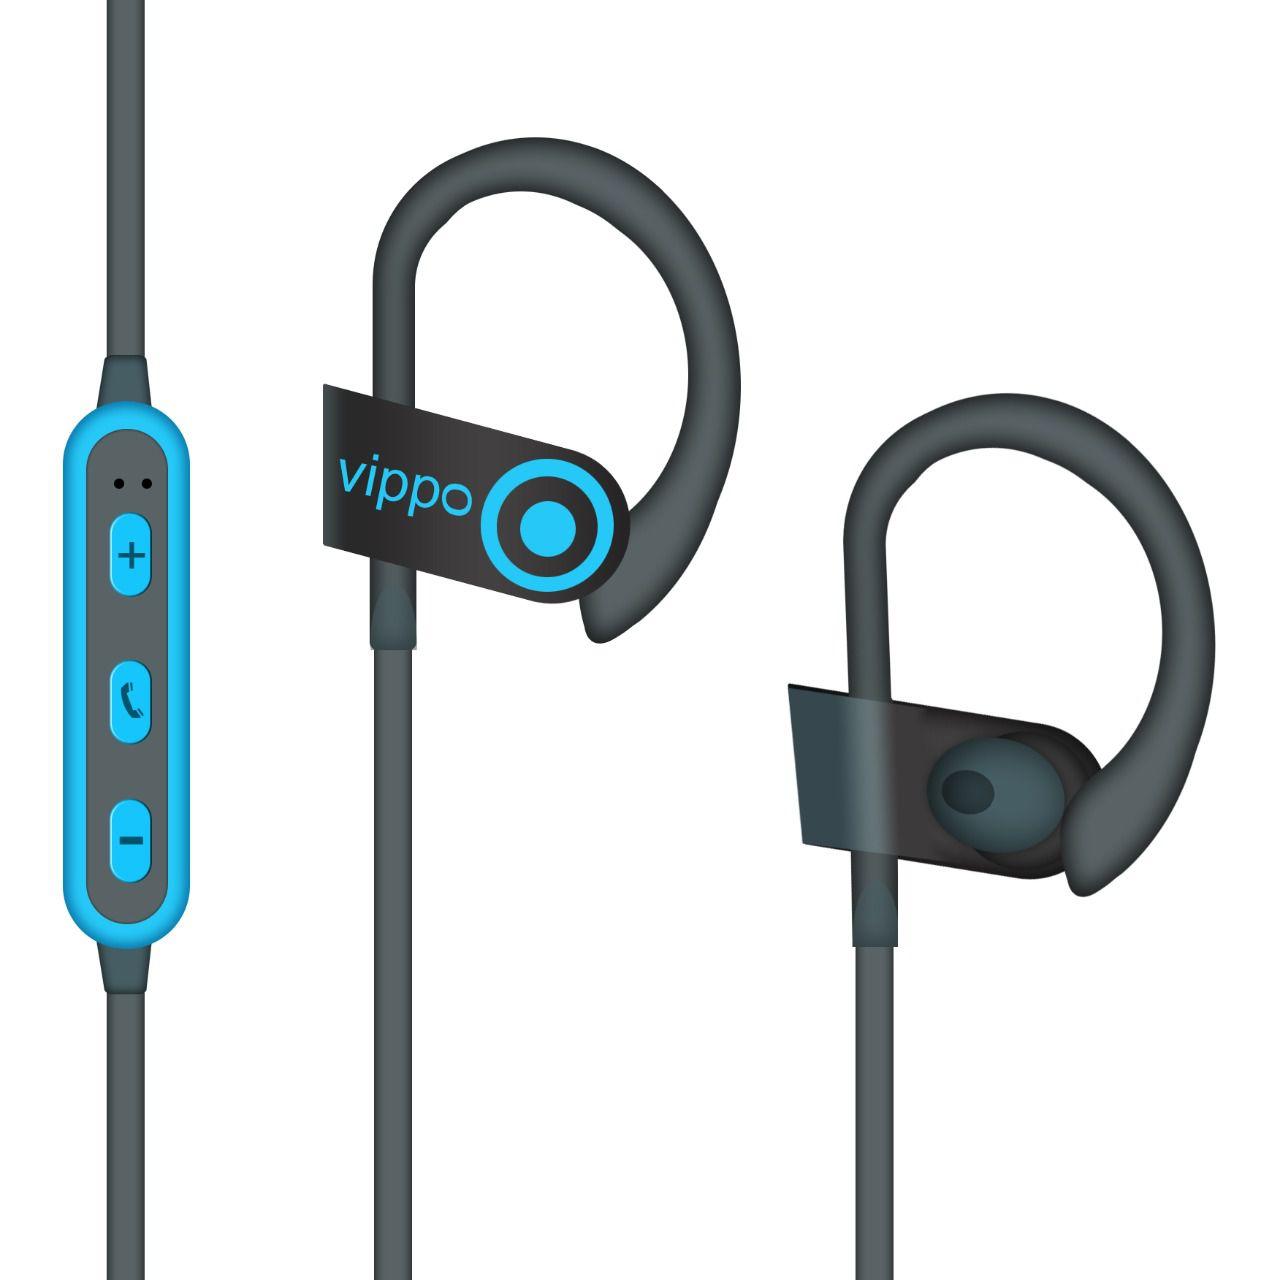 Hitage Vippo Qc 10 Mobicafe QC1086mc Wireless Bluetooth Headphone Blue